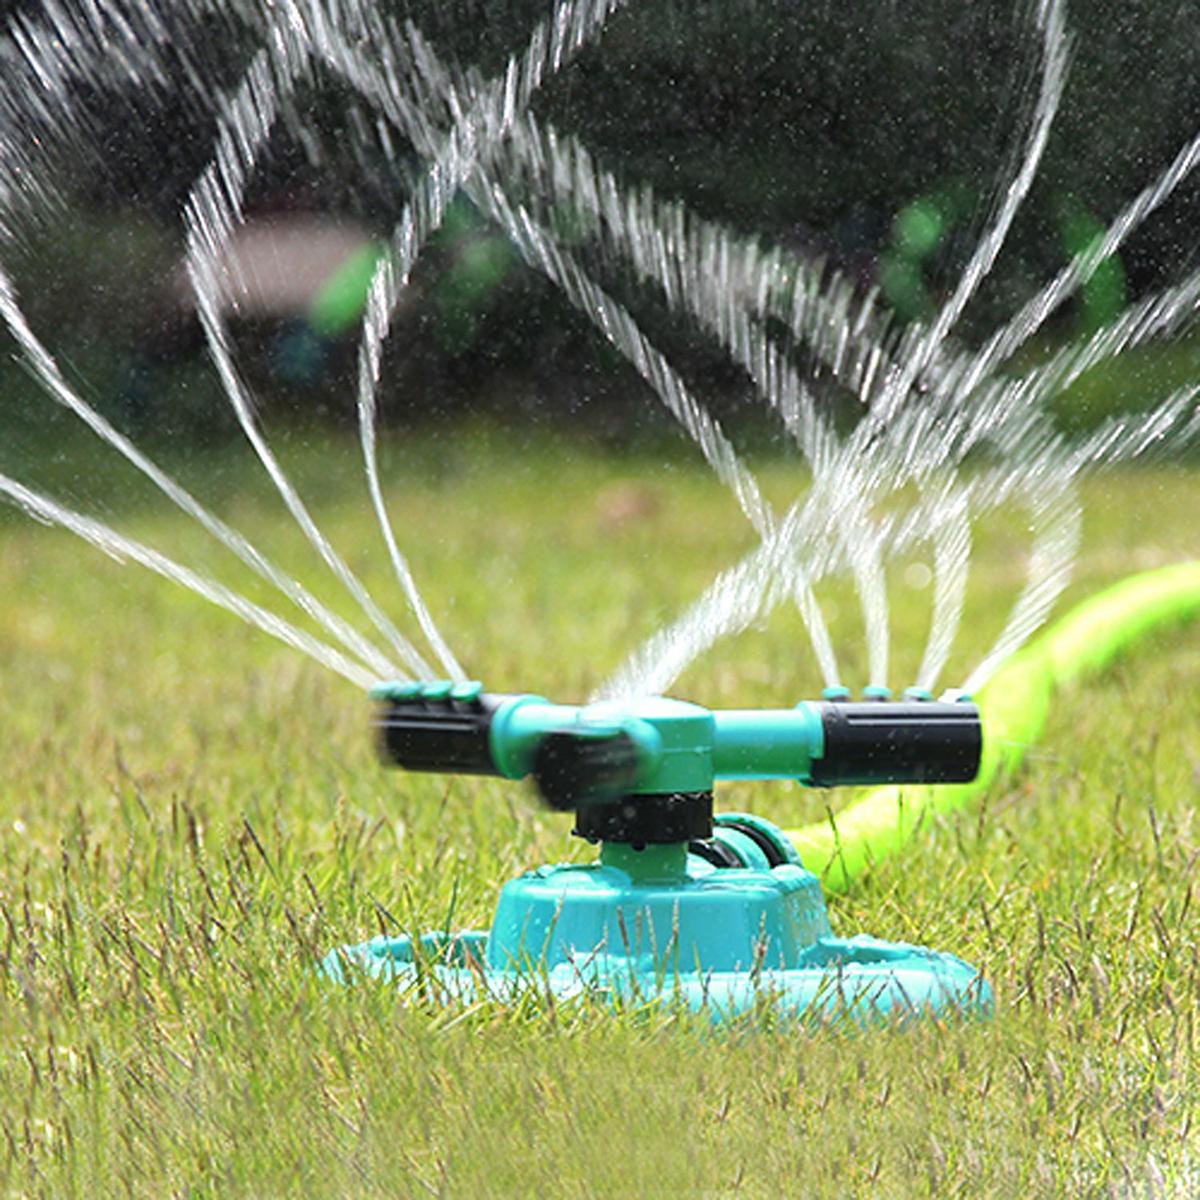 Watering Head Garden Brass Supplies Lawn Sprinkler Garden Sprinklers Water Durable Rotary Three Arm Water Sprinkler(China (Mainland))